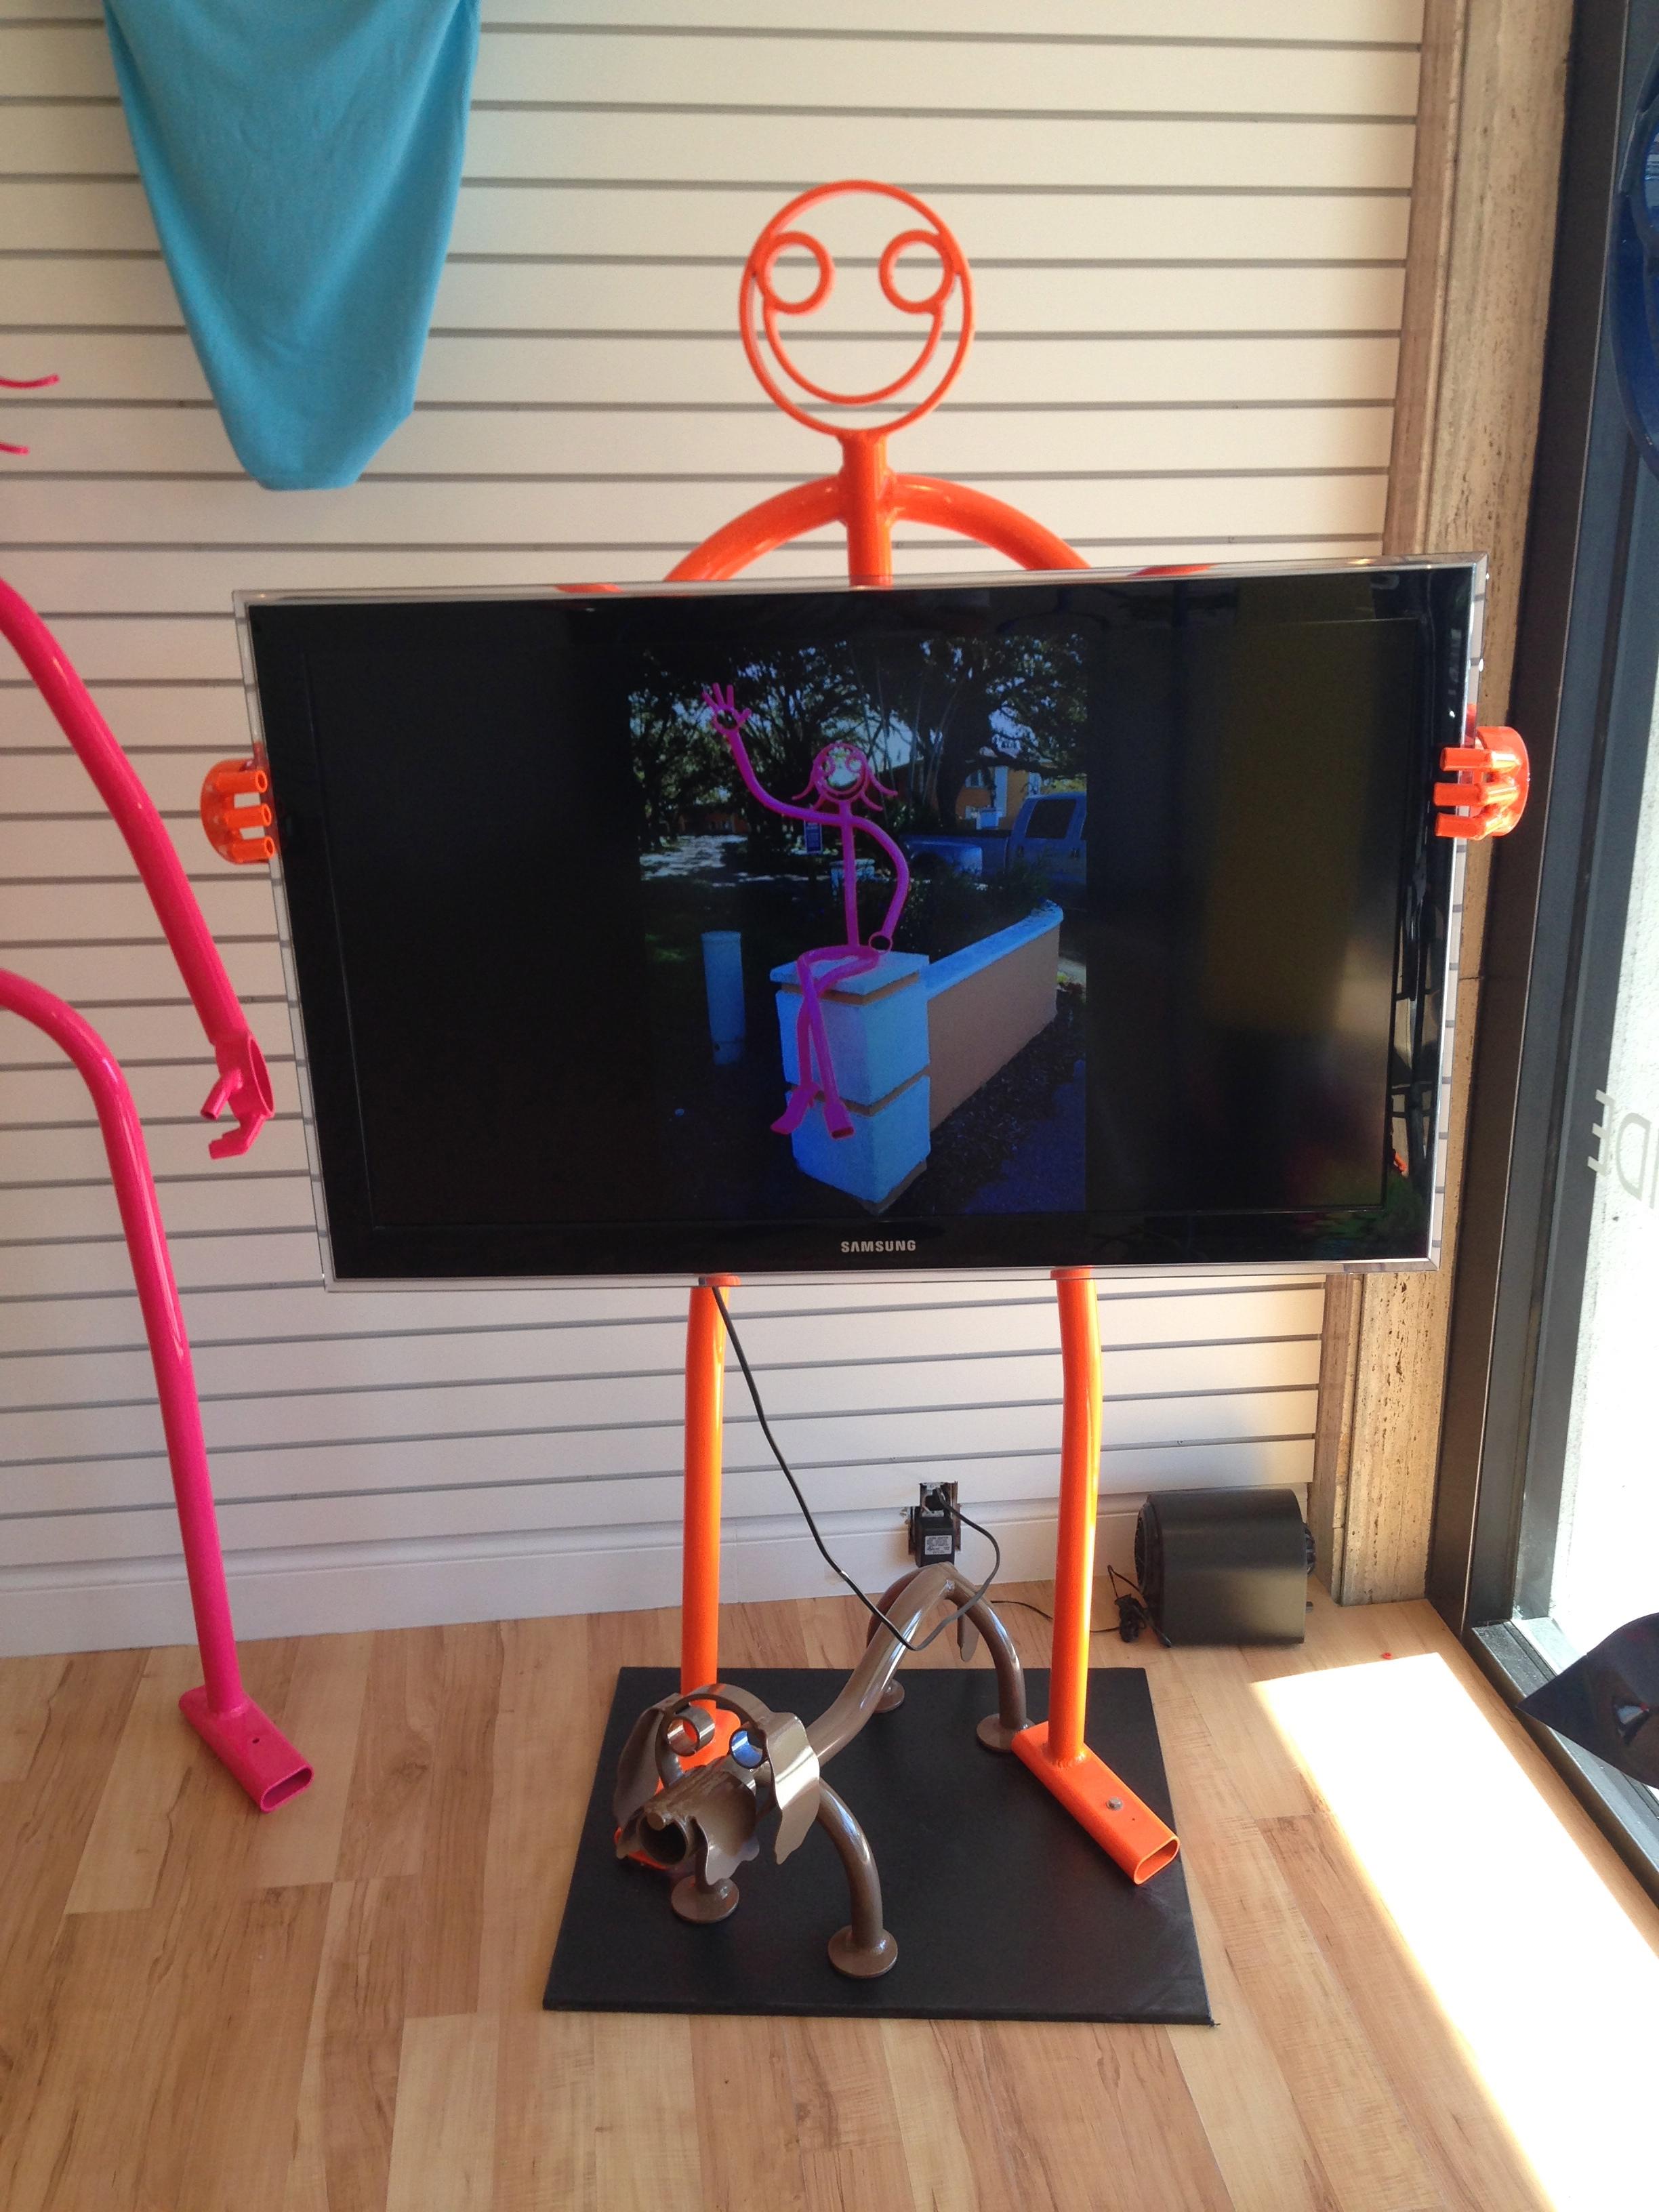 TV holding dude $1,600